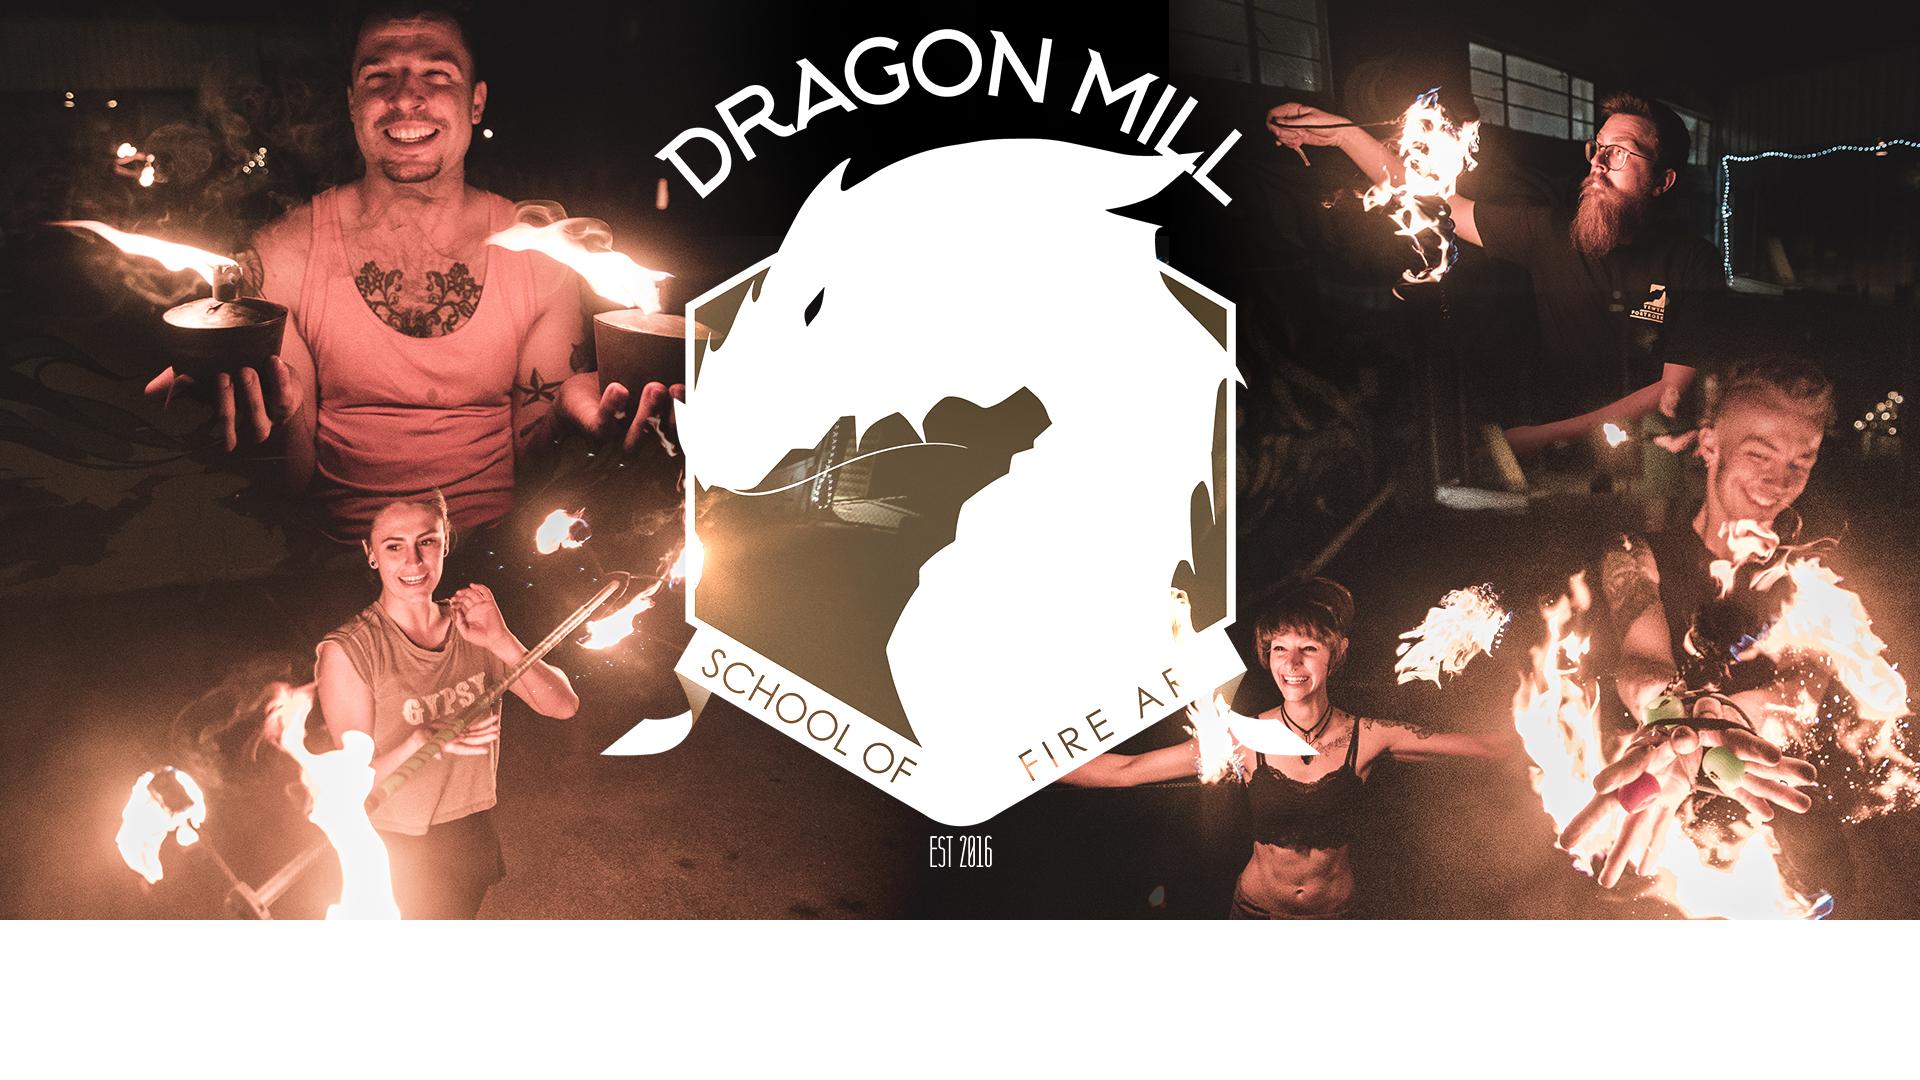 Dragon Mill - School of Fire Art   Term 2 2020